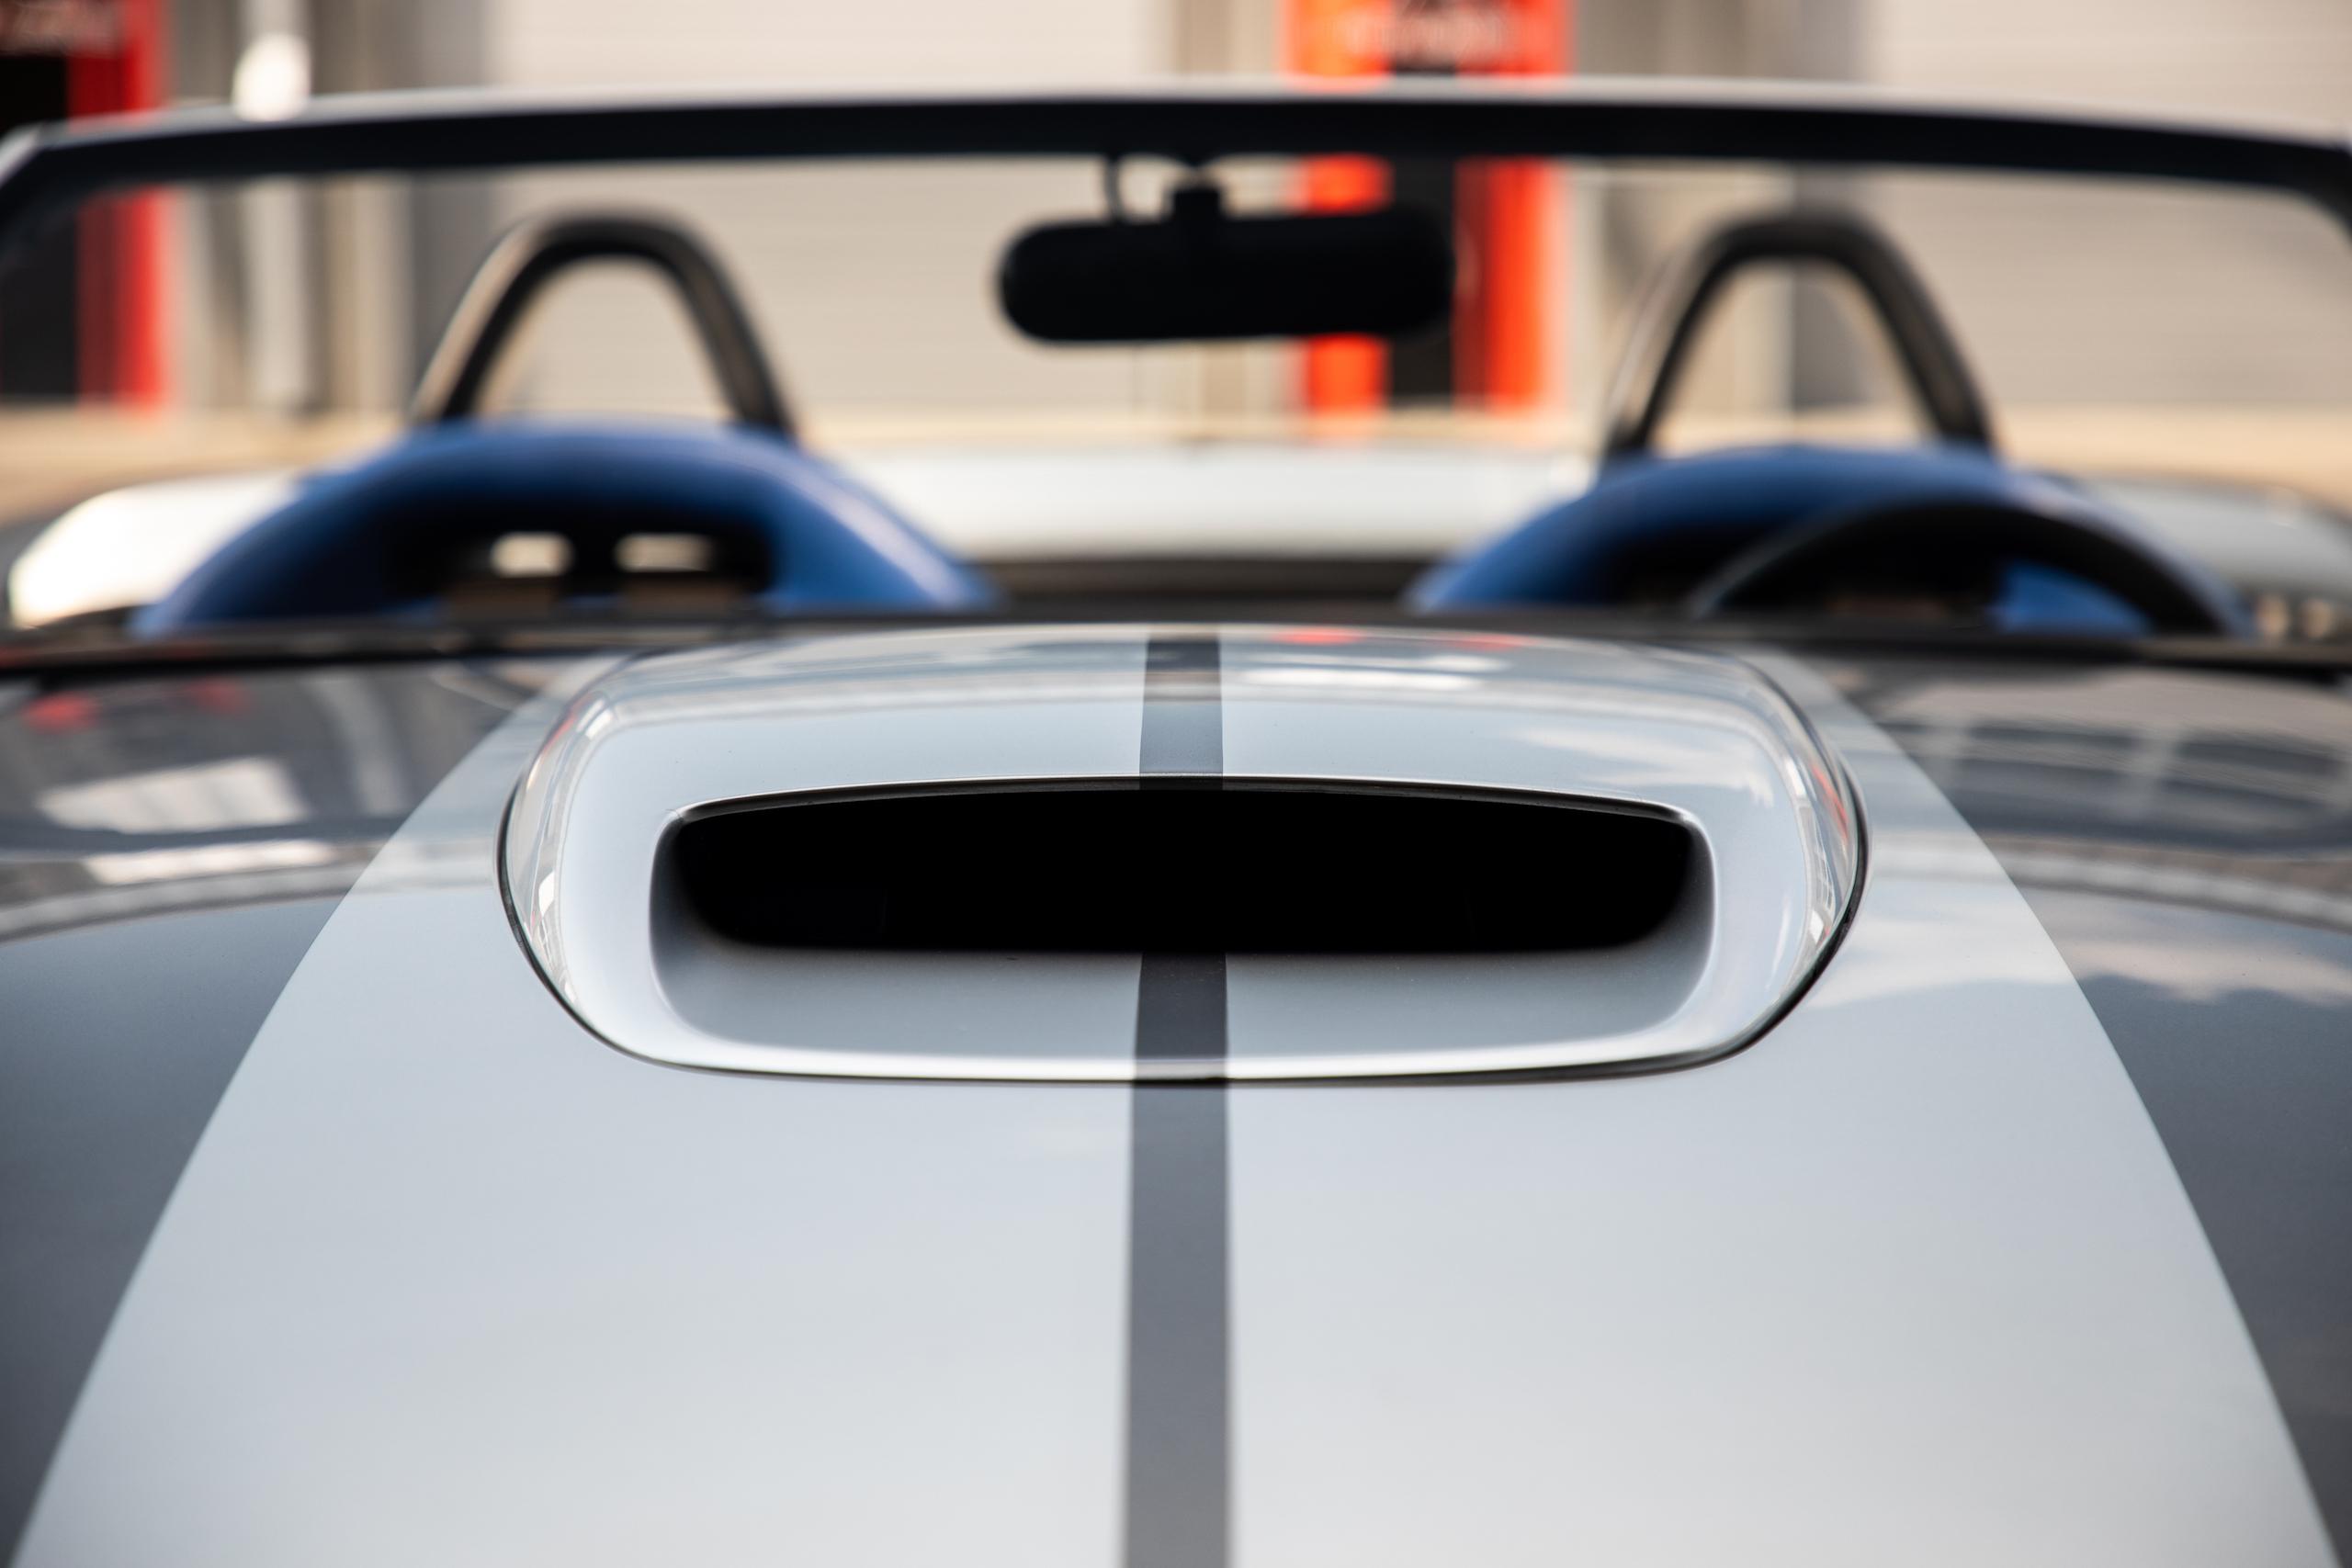 Cobra Concept front scoop vent